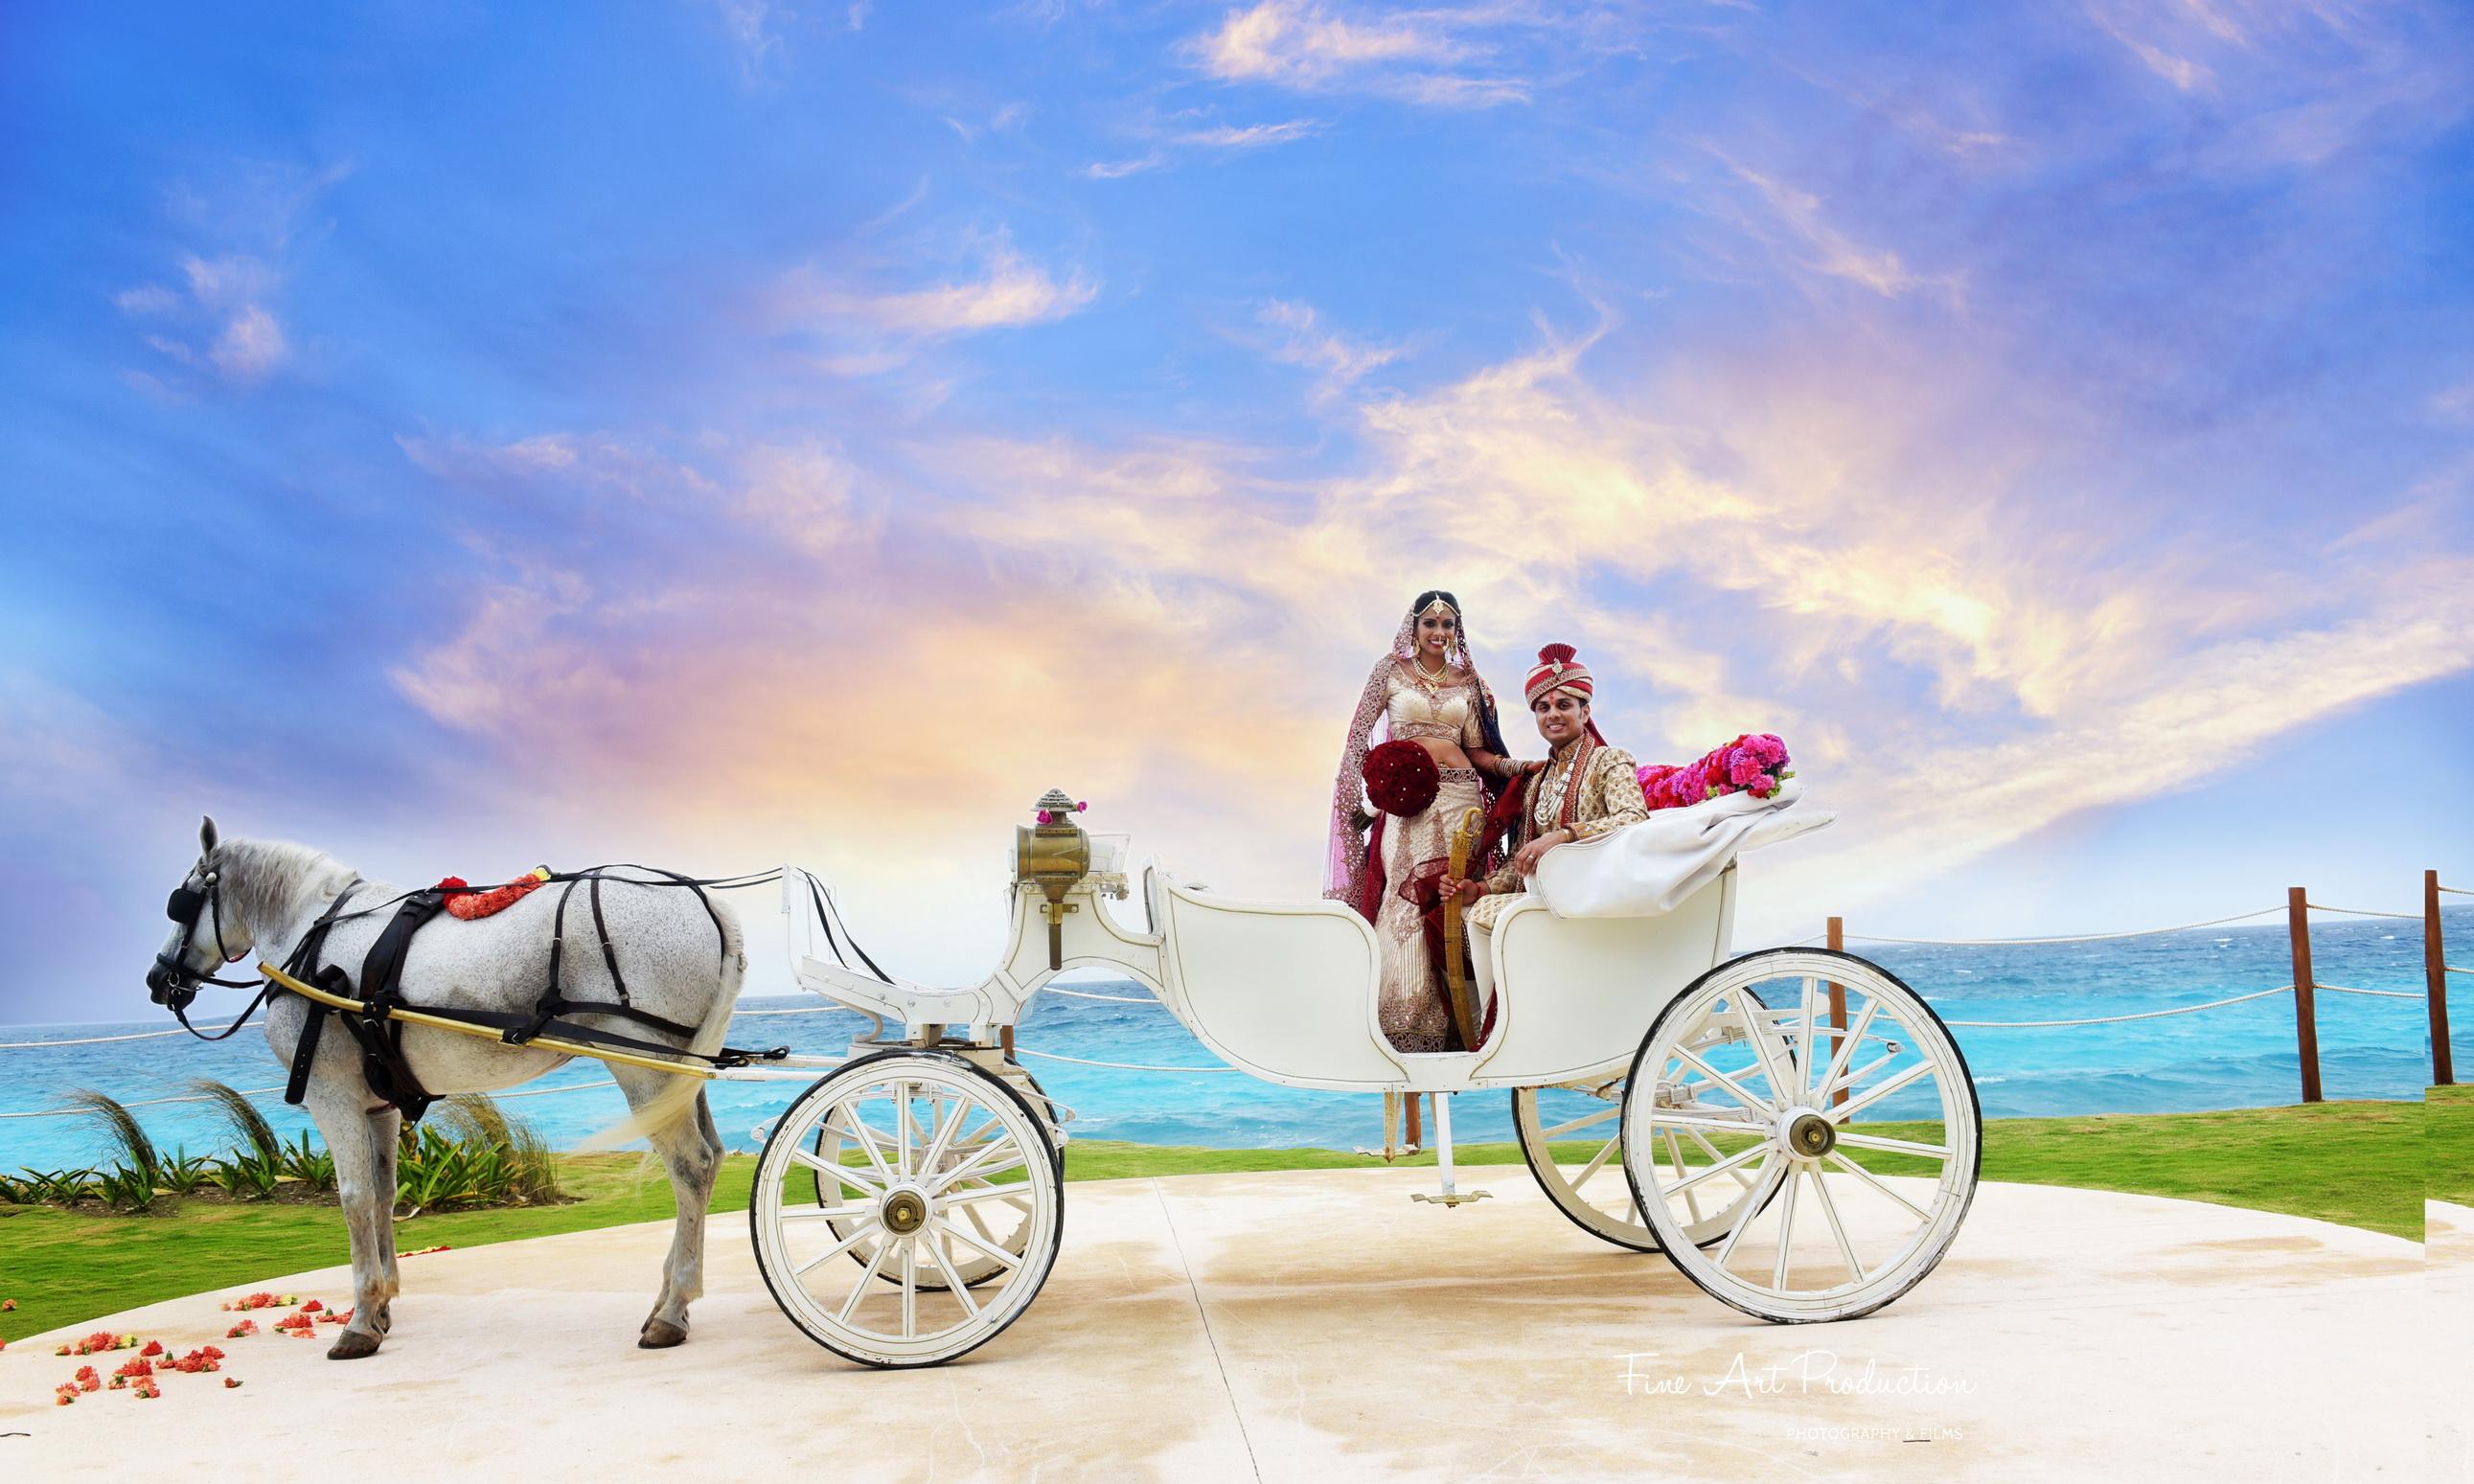 india-wedding-photographer-fine-art-production-chirali-amish-thakkar_0136